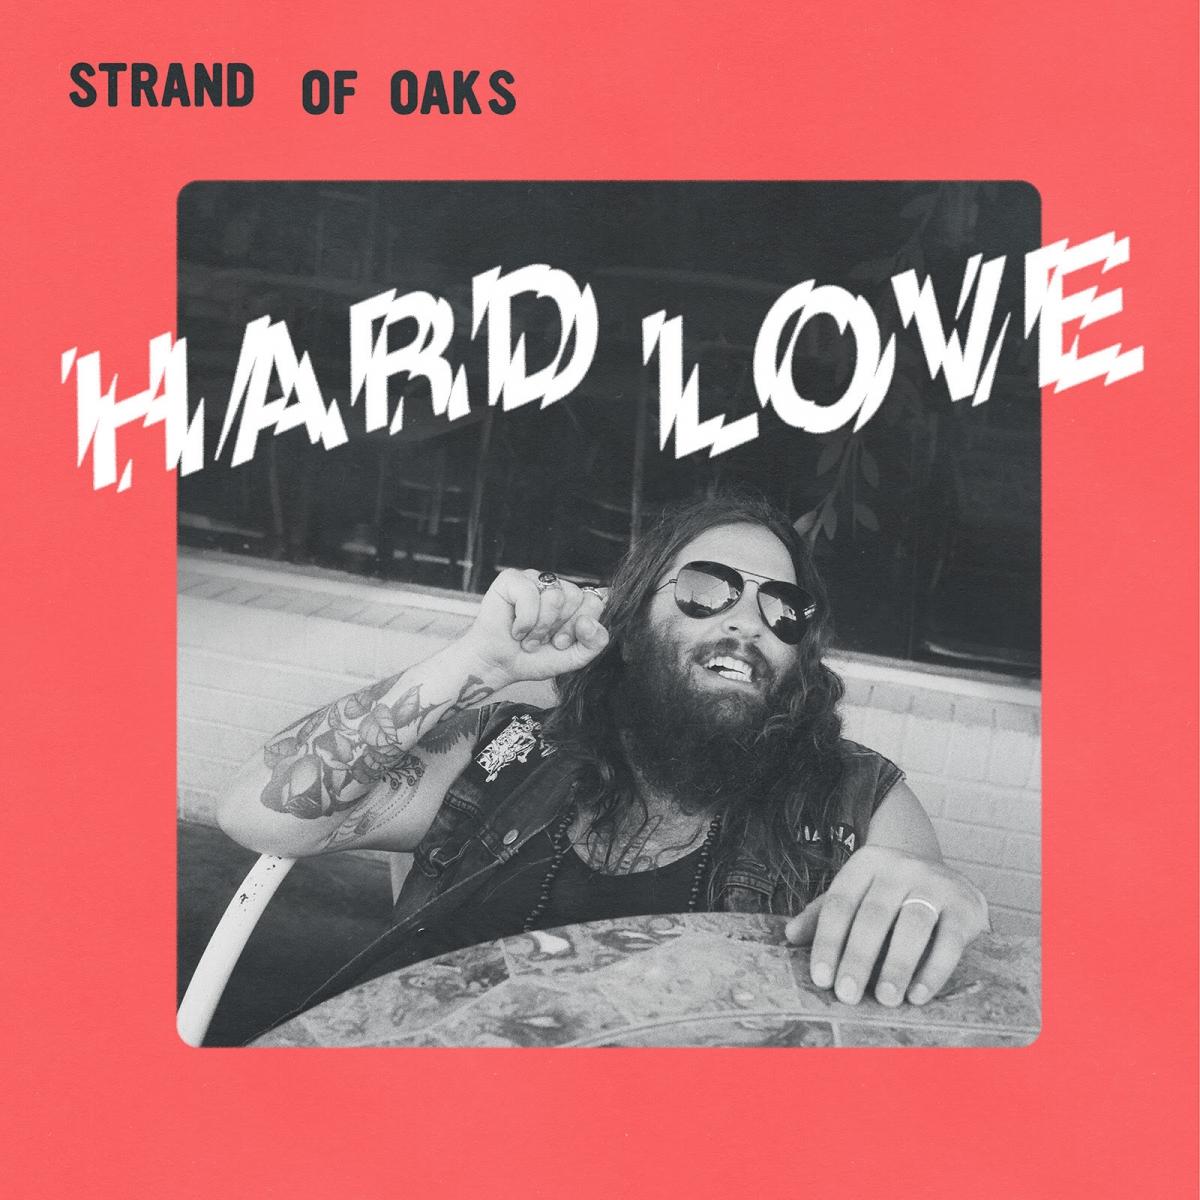 Strand Of Oaks streams new album 'Hard Love'